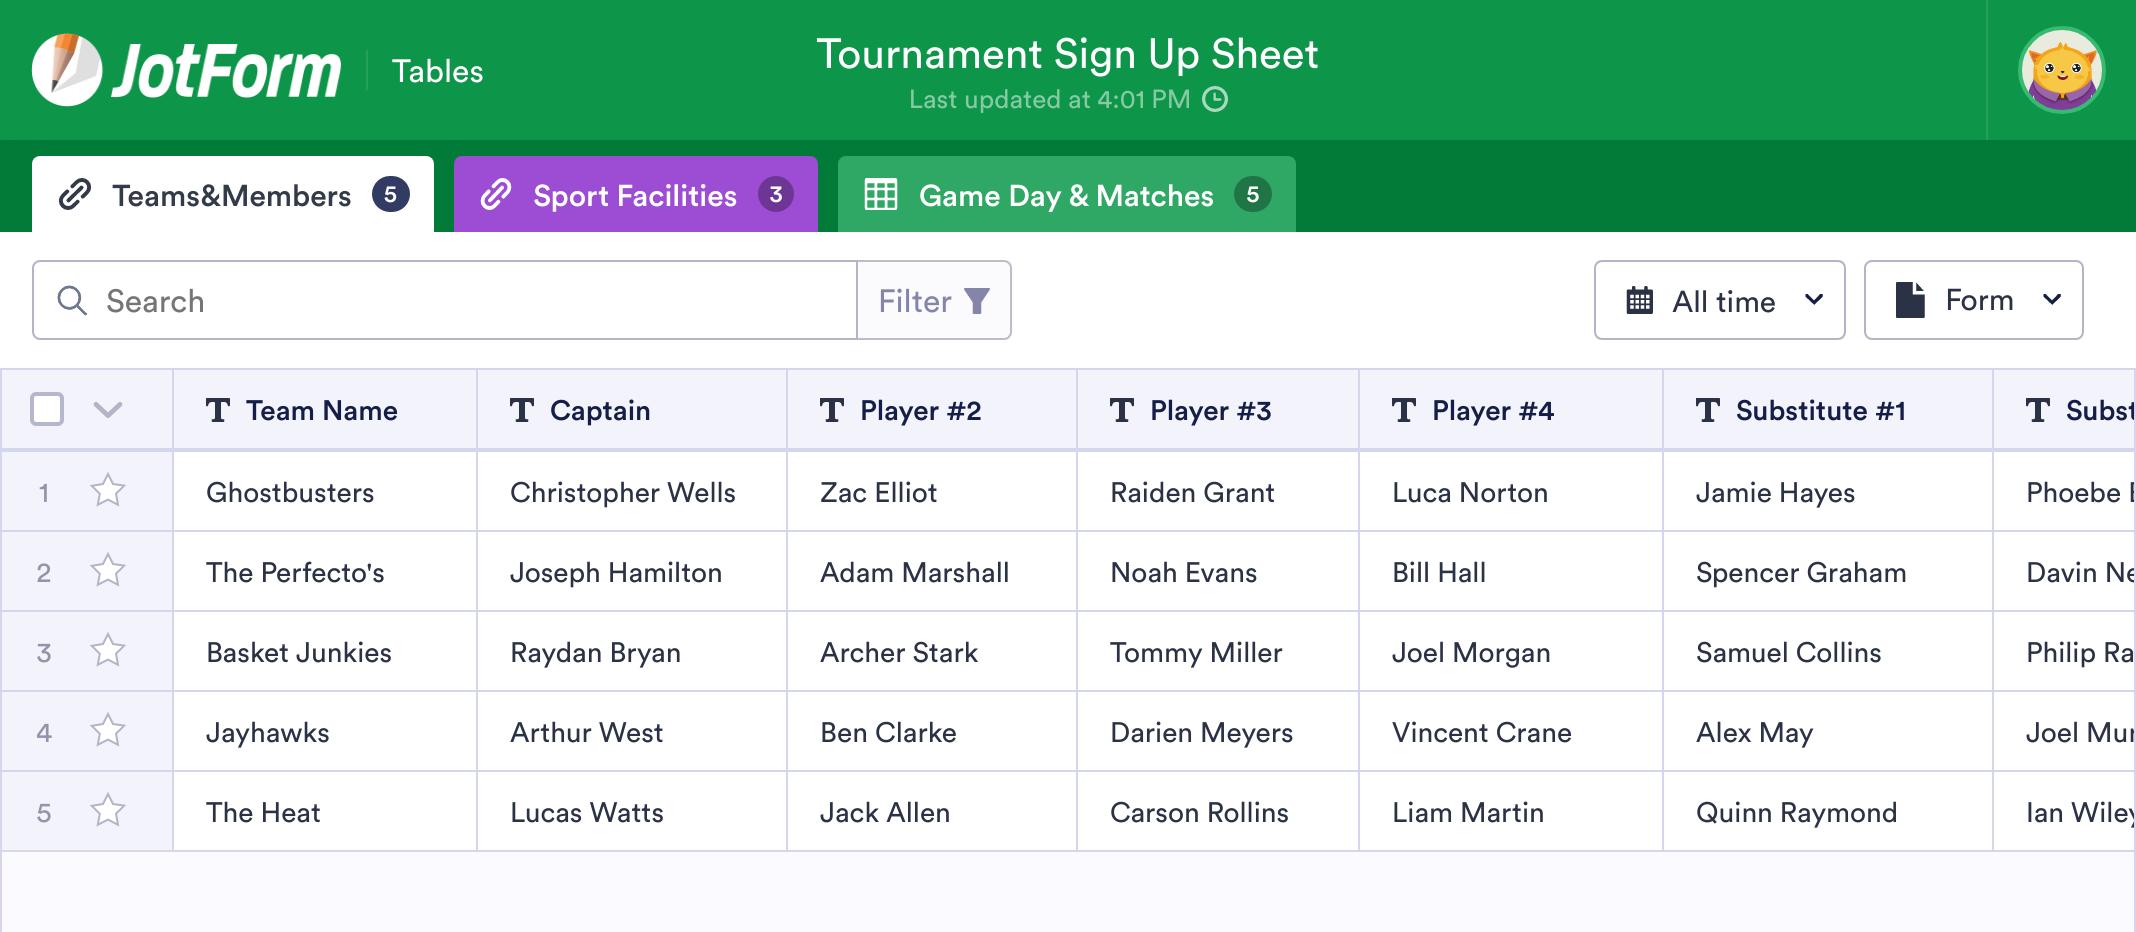 Tournament Sign Up Sheet